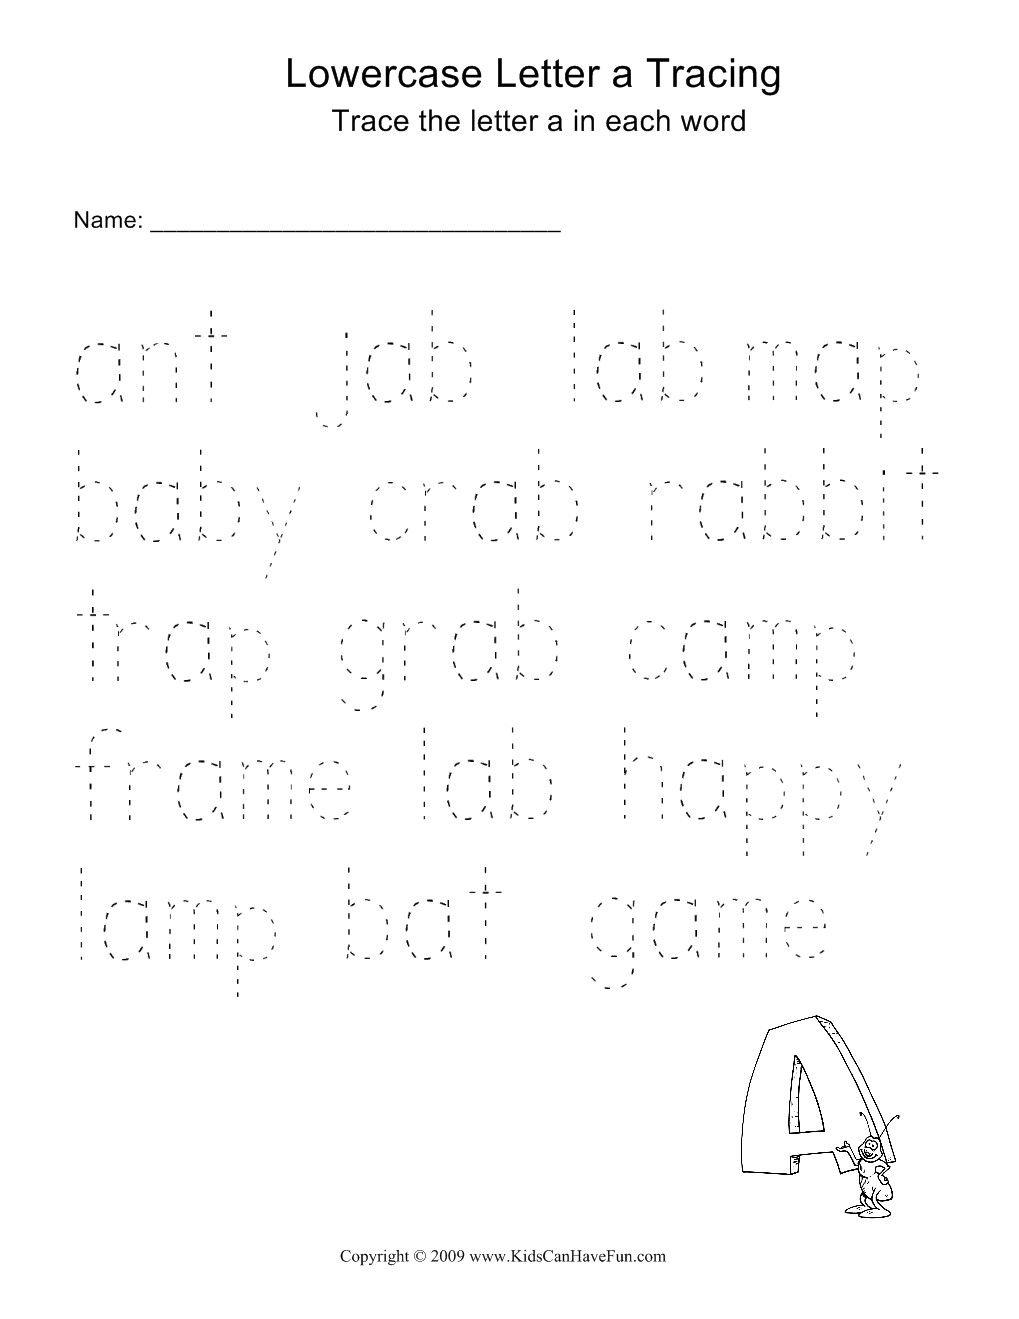 Word Tracing Worksheets For Kids | Kindergarten Reading